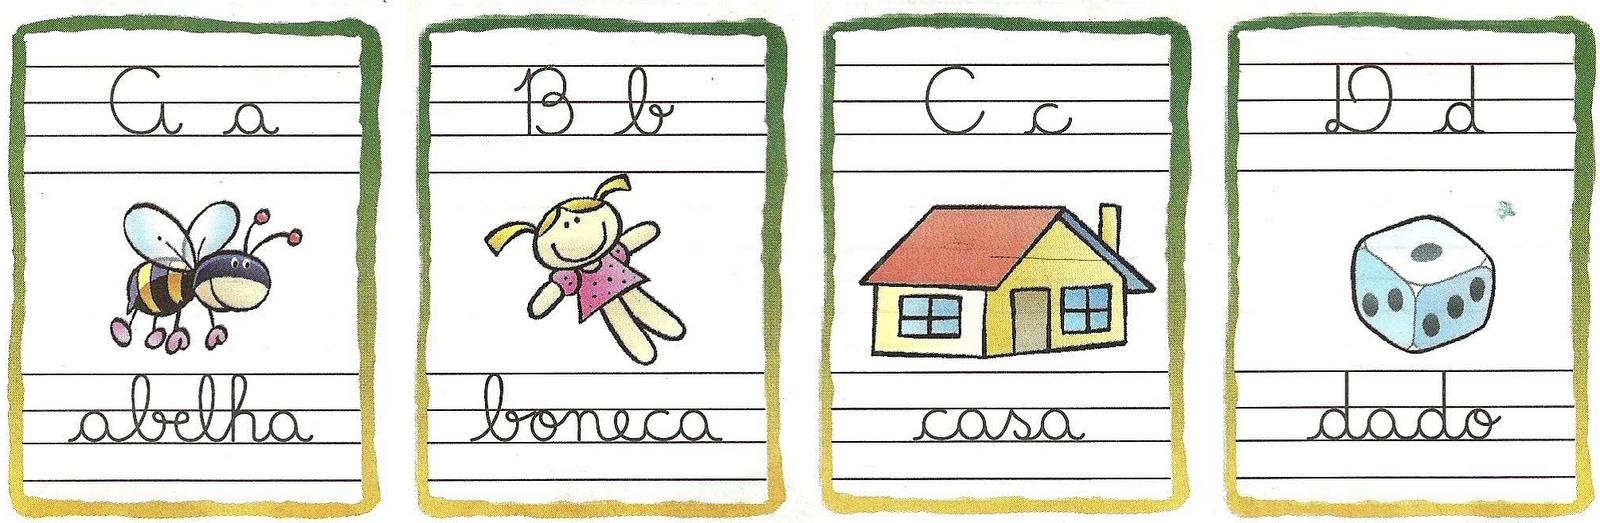 Alfabeto Ilustrado Com Letras Cursivas S Escola -> Desenhos Para Alfabeto Ilustrado